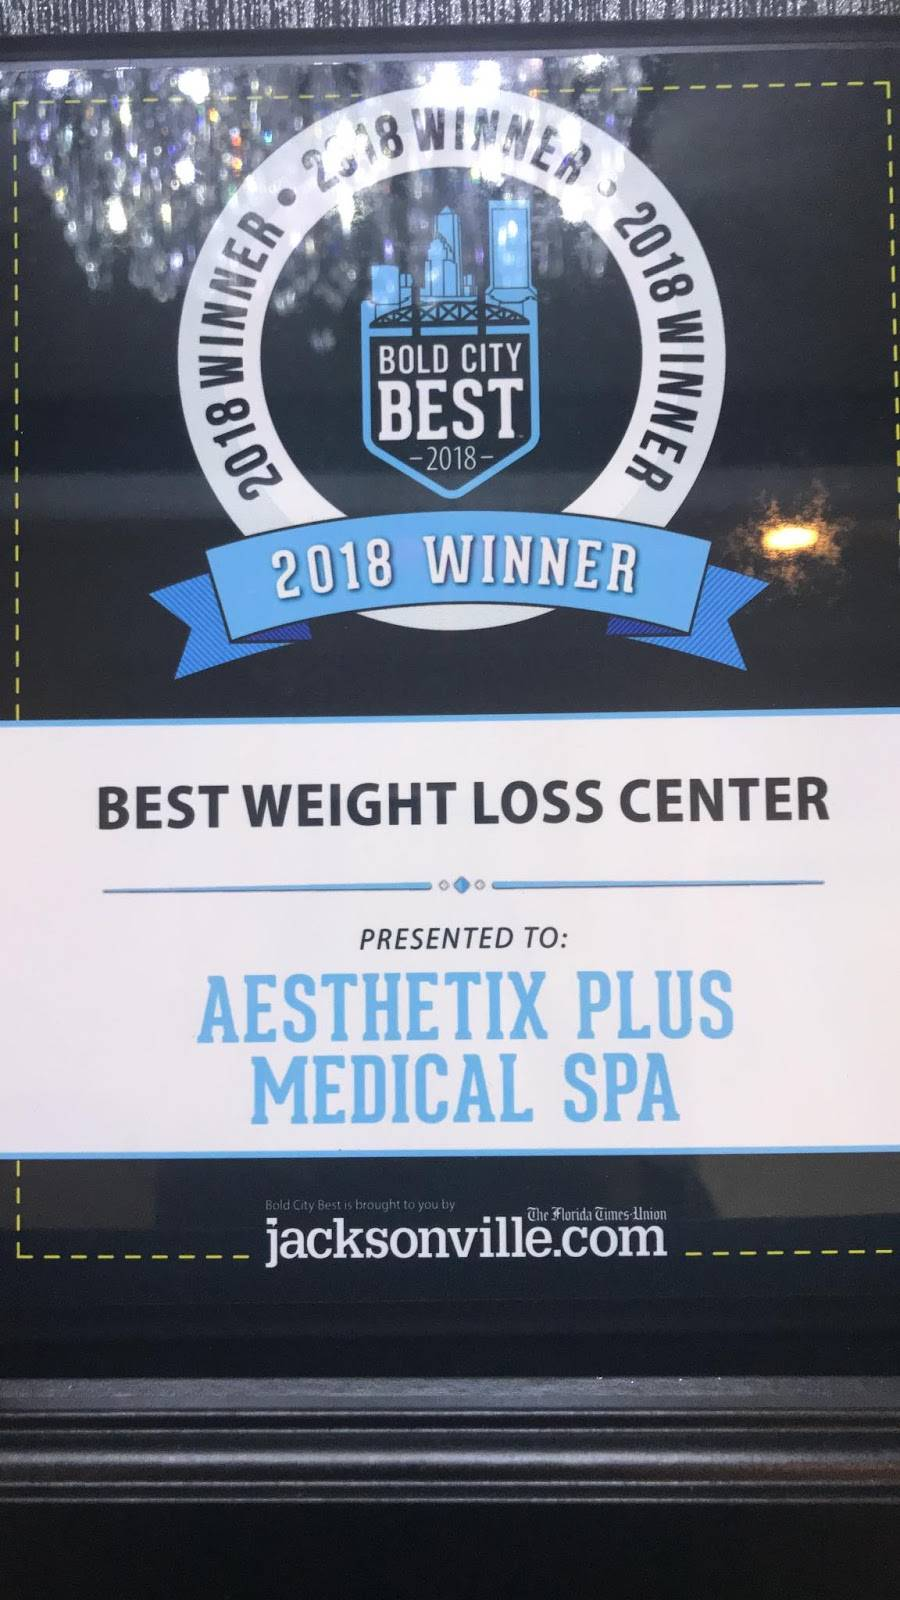 Aesthetix Plus Medical Spa - hair care  | Photo 7 of 7 | Address: 351 Town Plaza Ave Ste 202, Ponte Vedra Beach, FL 32081, USA | Phone: (904) 834-3440